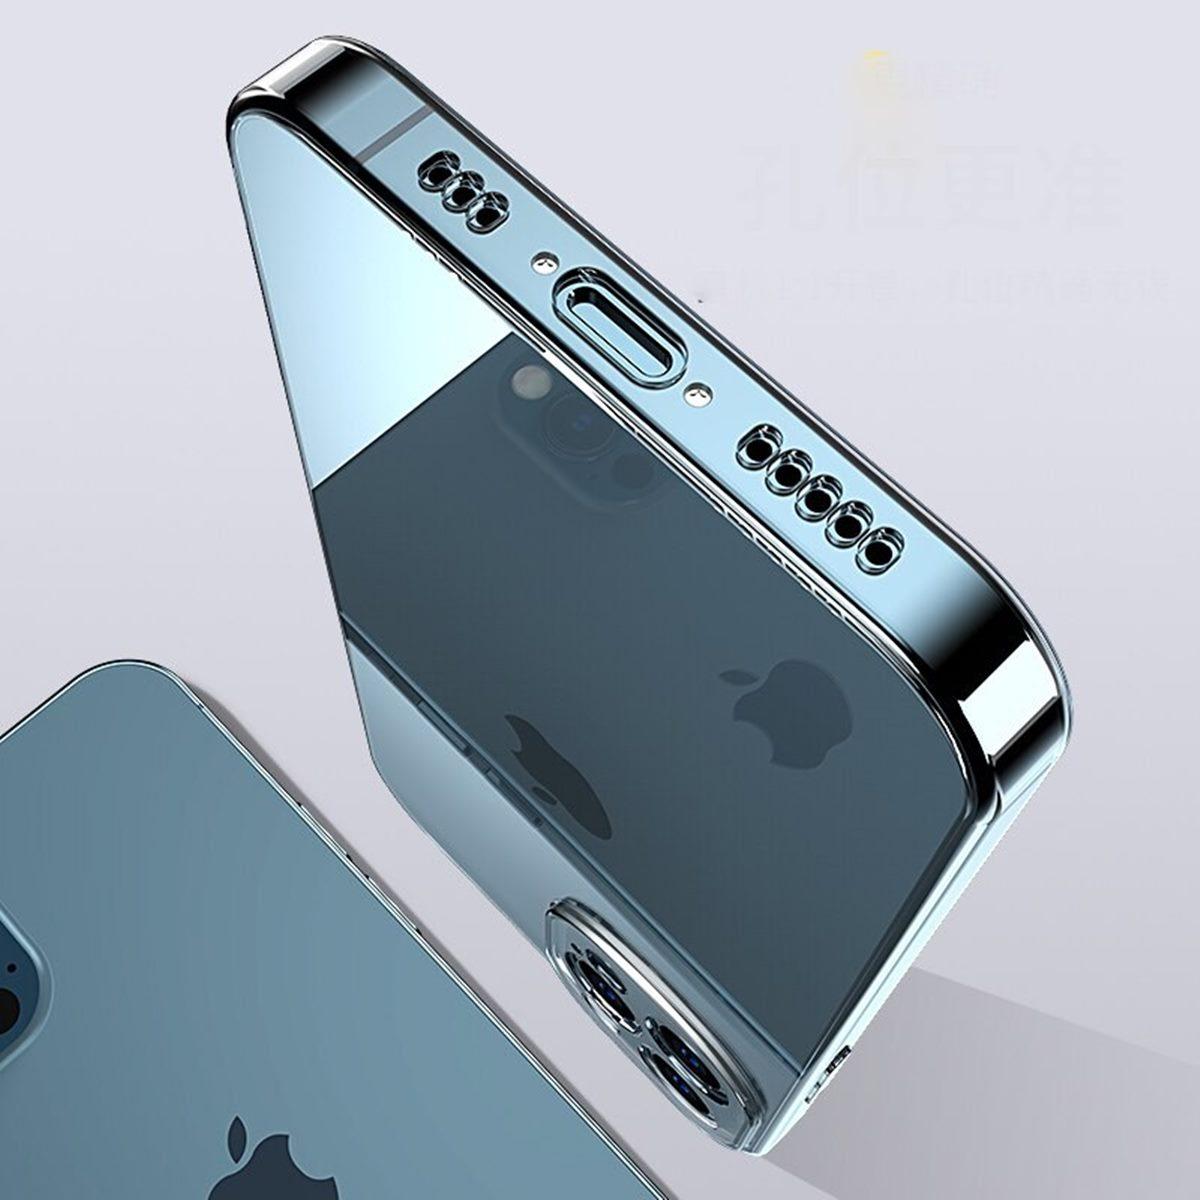 iPhone 13設計大曝光!電池容量增加變「厚片手機」,還有「二筒」鏡頭會消失